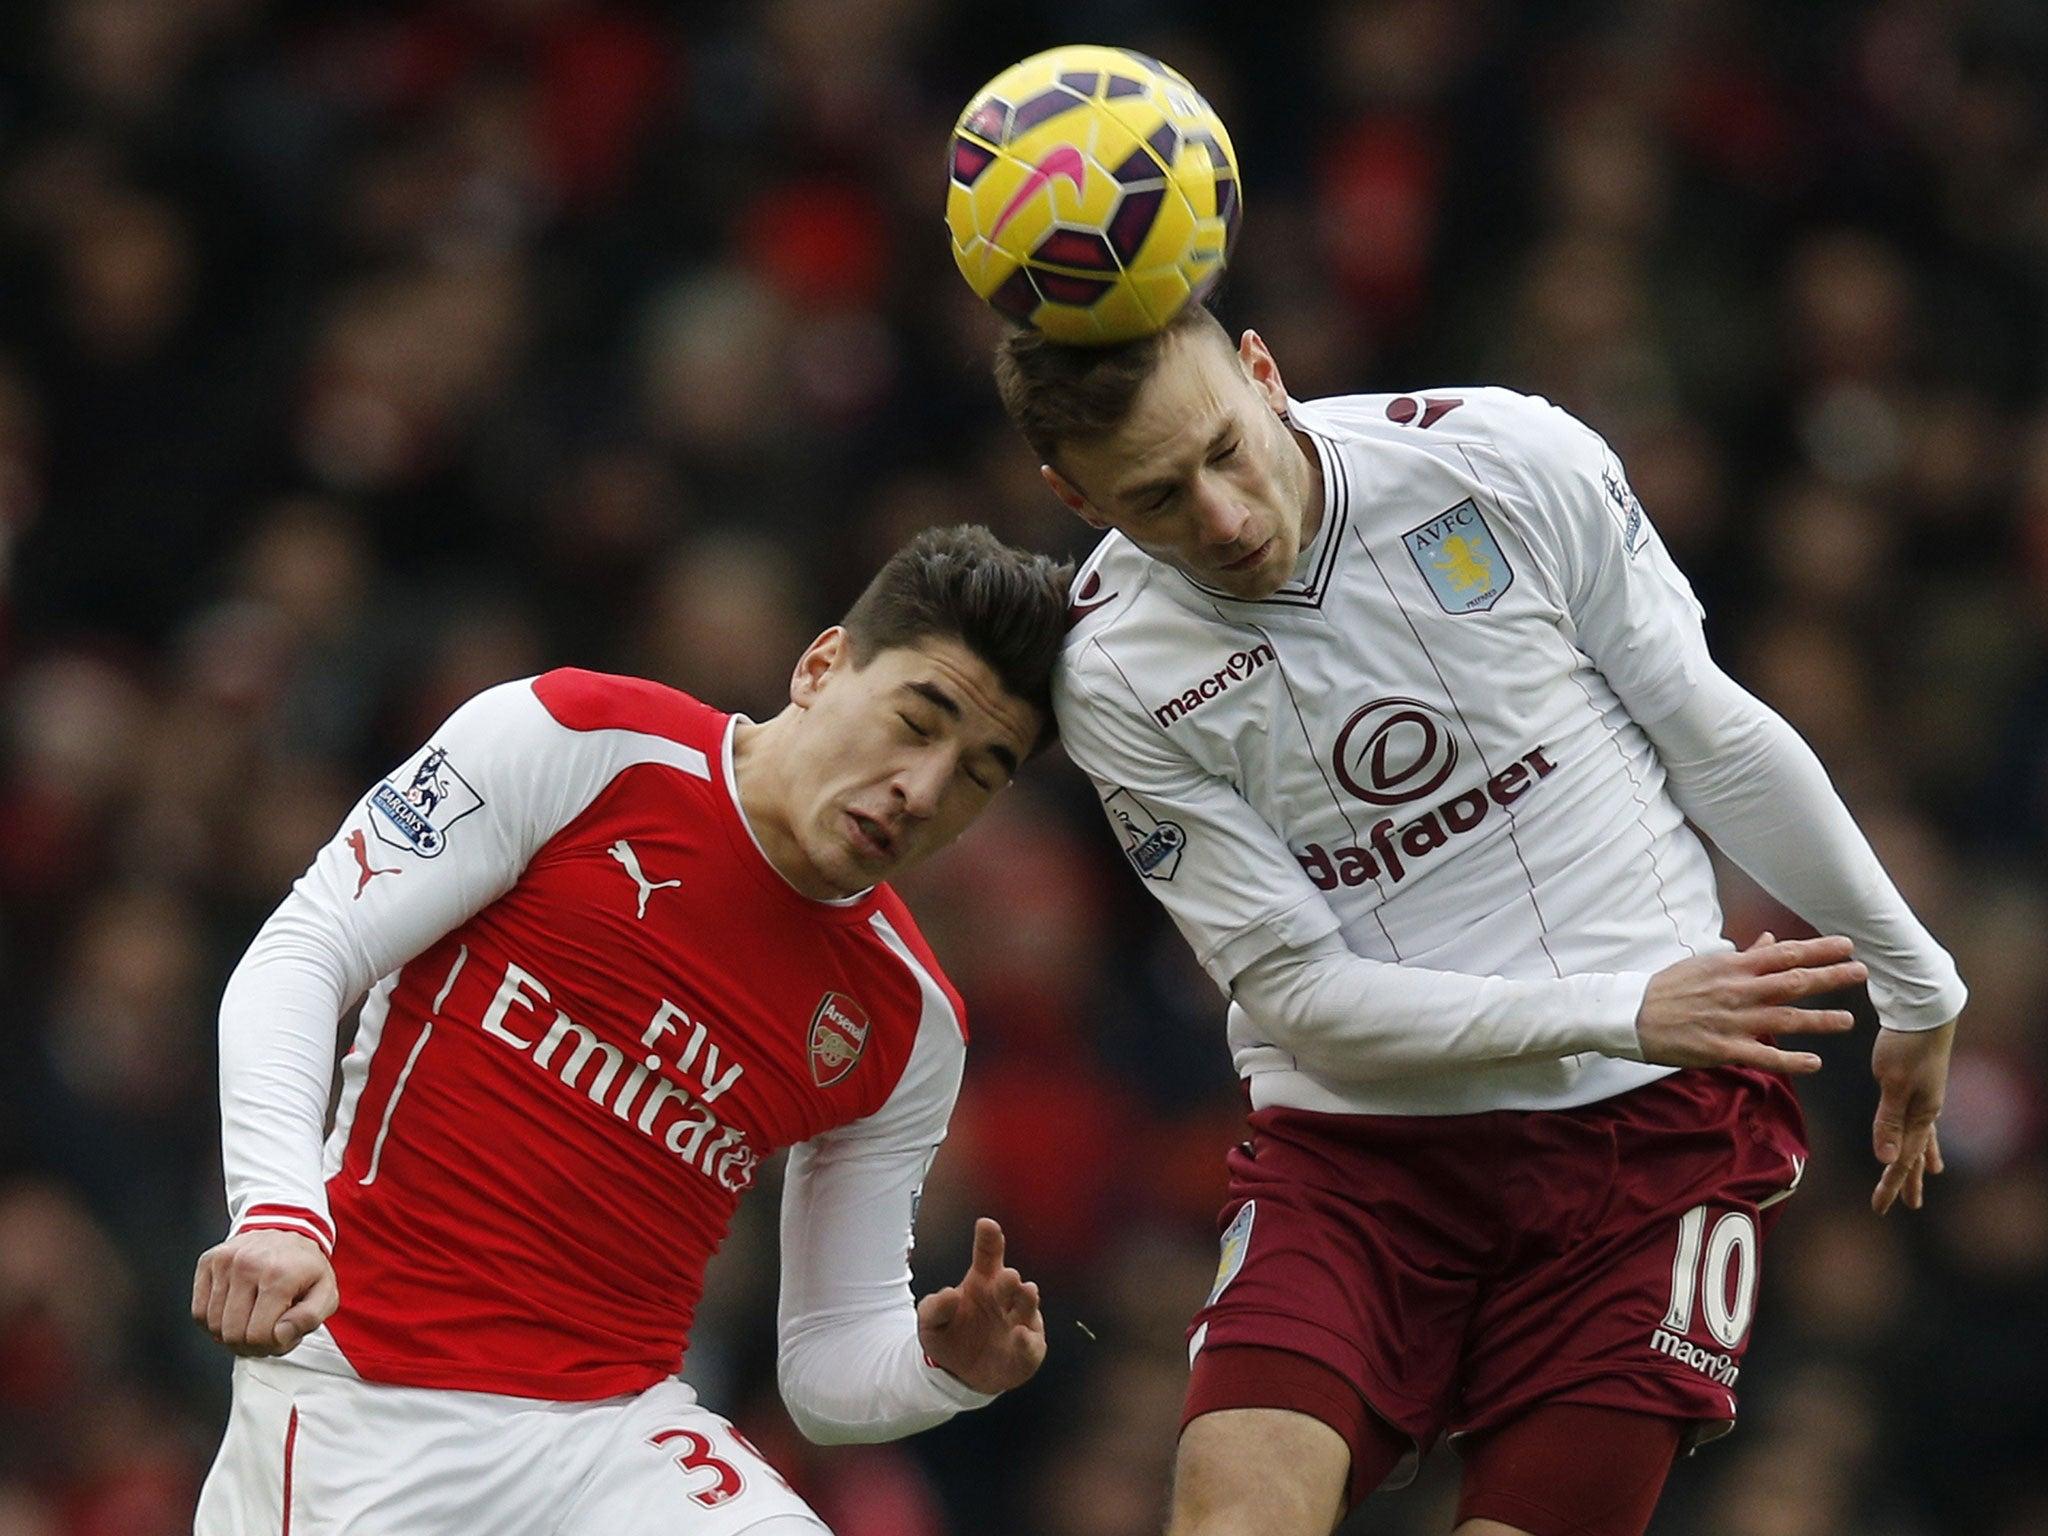 Mesut Ozil goal celebration explained: Arsenal midfielder clears up